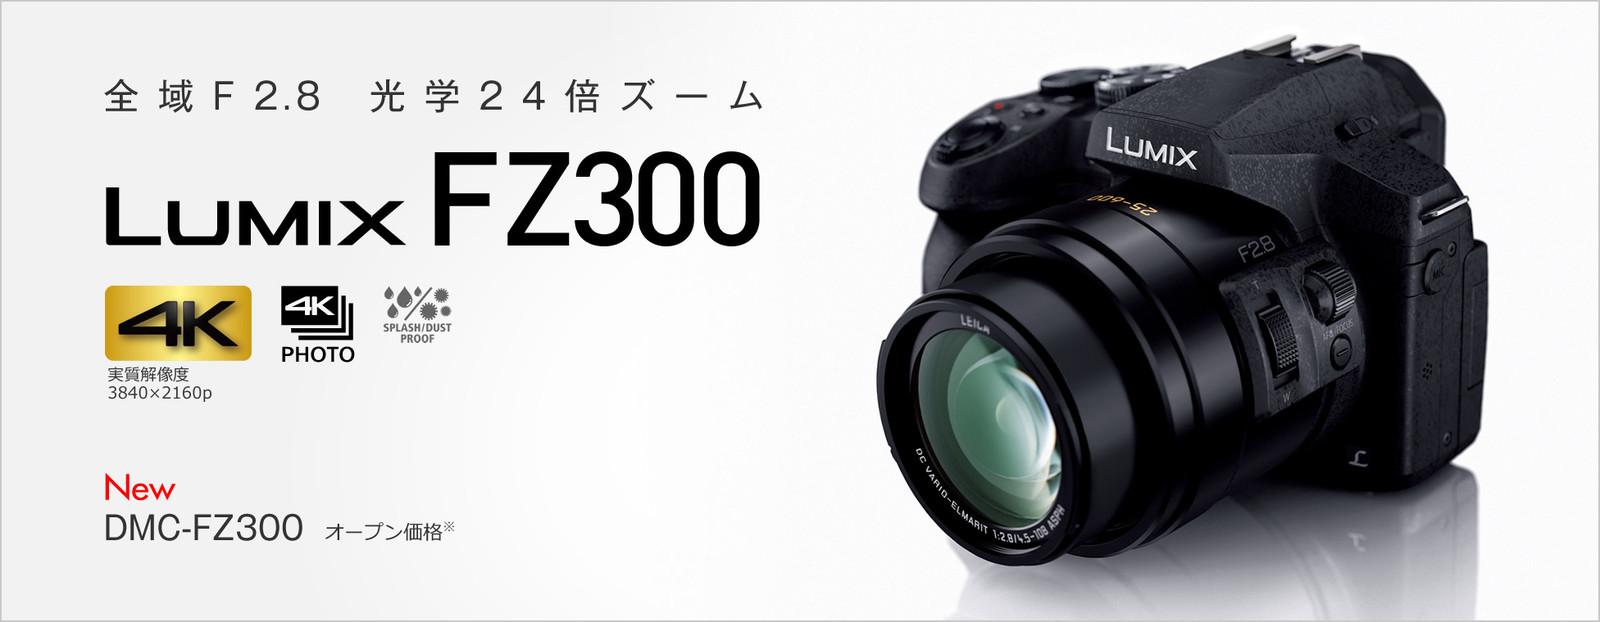 Fz300_2